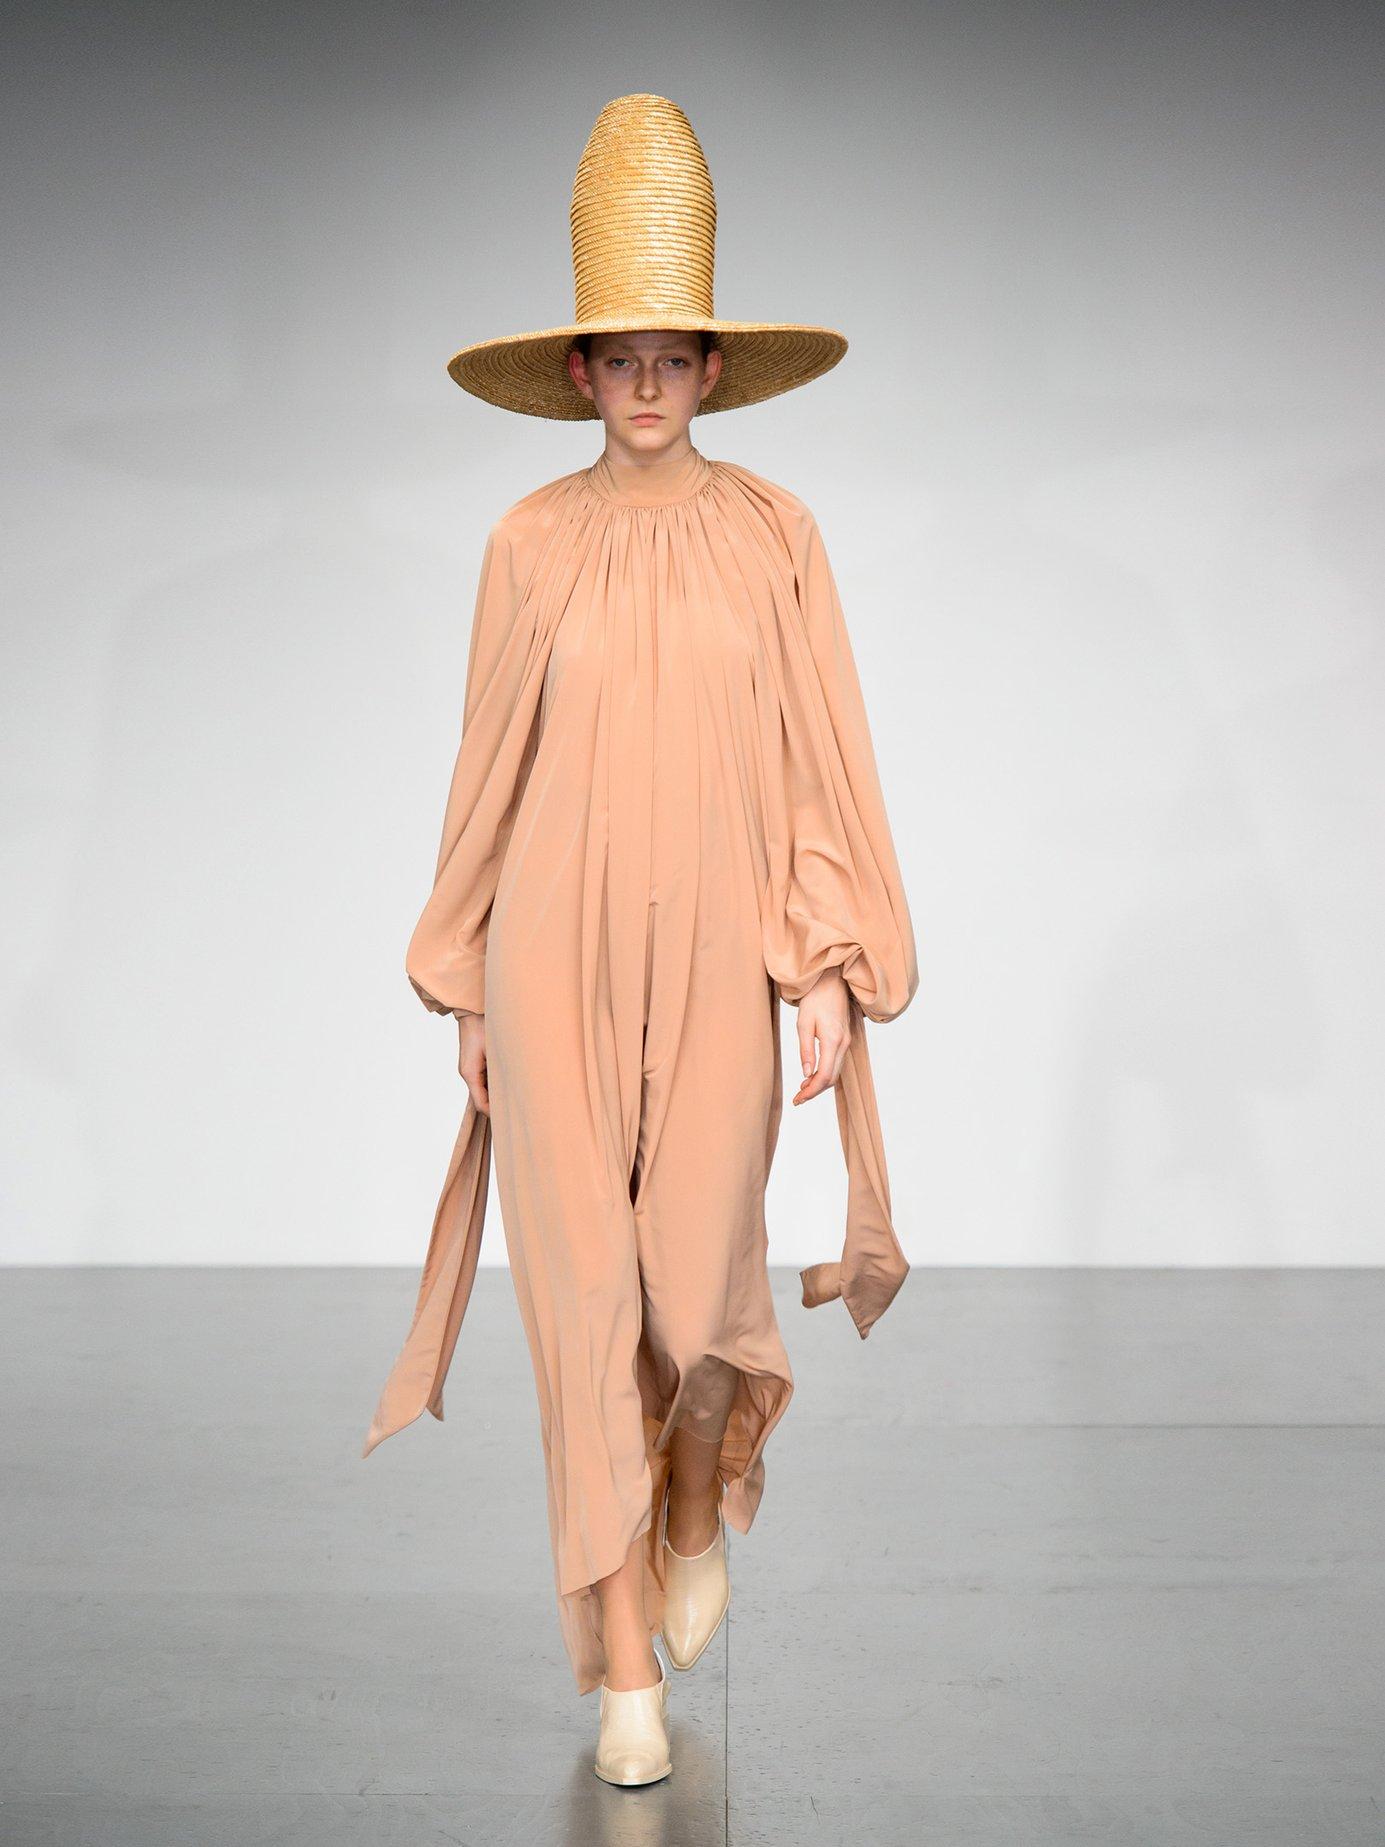 Gathered crepe dress by Sonia Rykiel